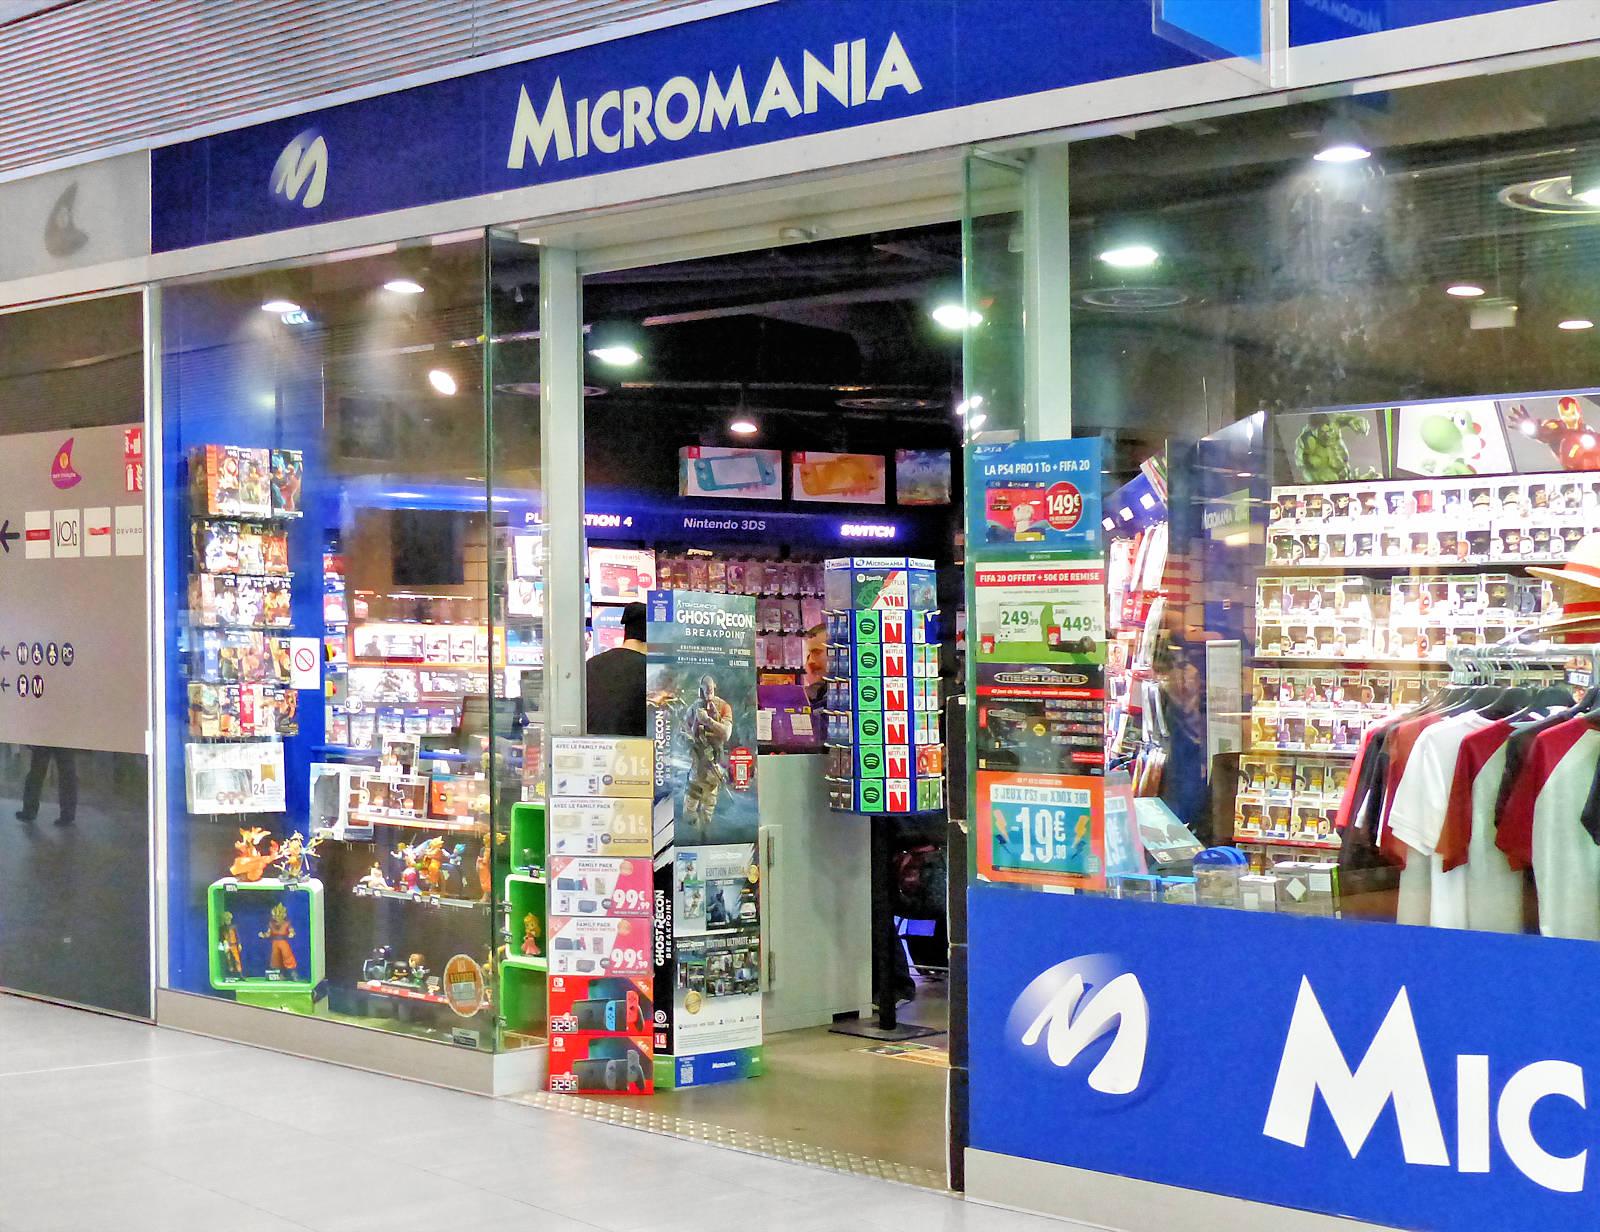 Micromania Tourcoing - Espace Commercial Saint-Christophe